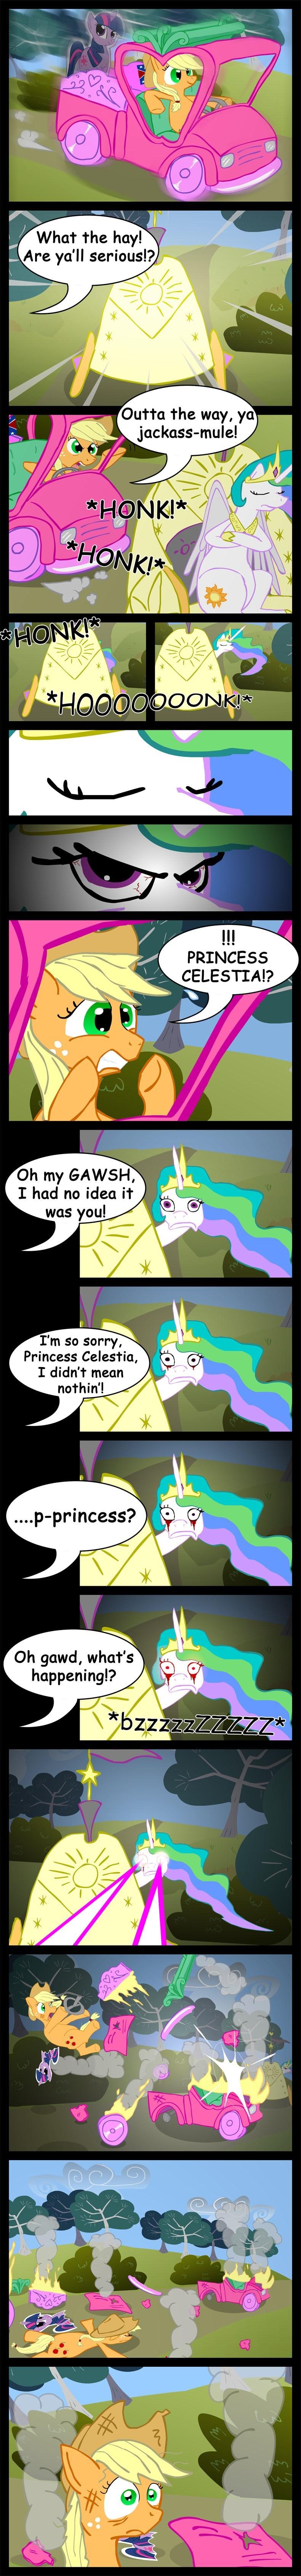 applejack toys twilight sparkle Hasbro princess celestia - 8605852160